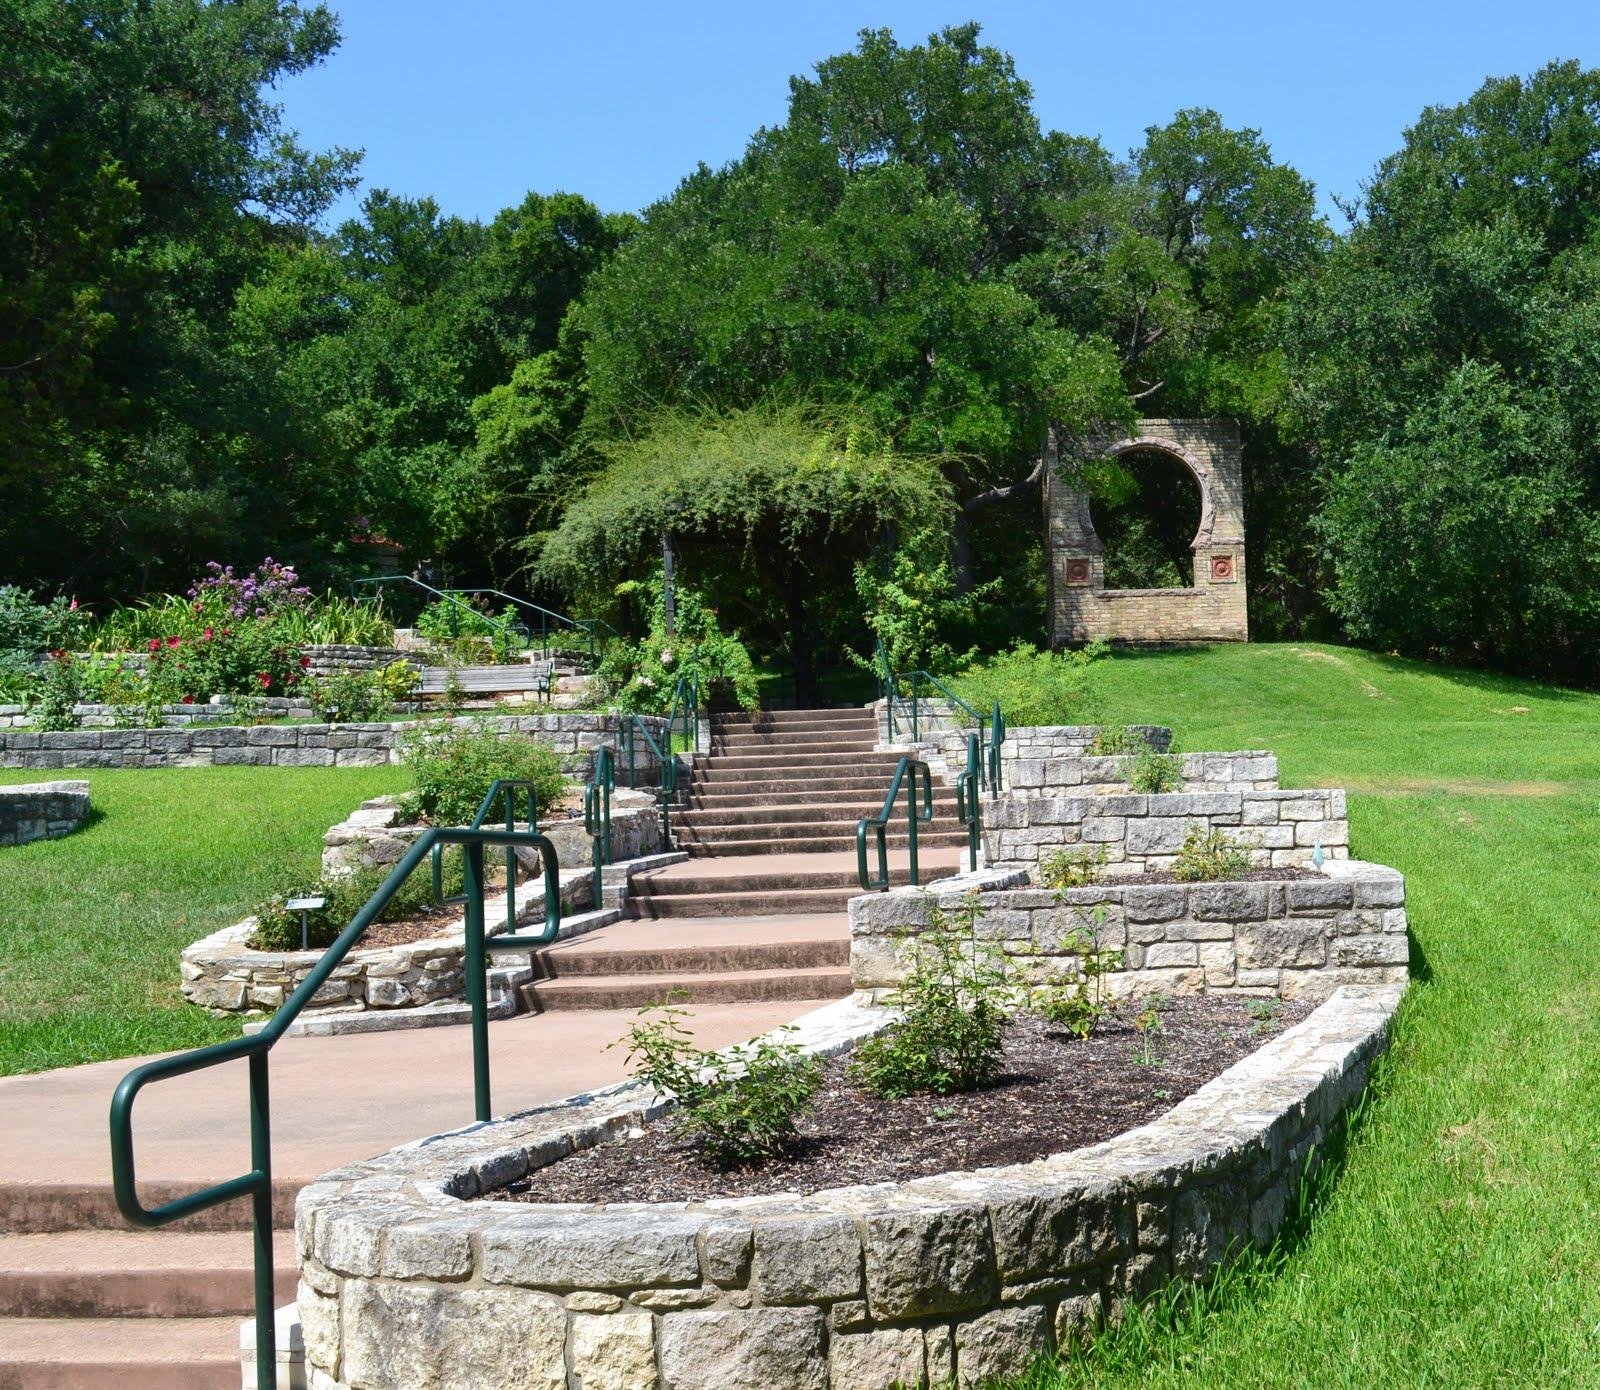 Zilker Botanical Gardens Zilker Botanical Garden In Expedia Zilker Botanical Garden Parks And